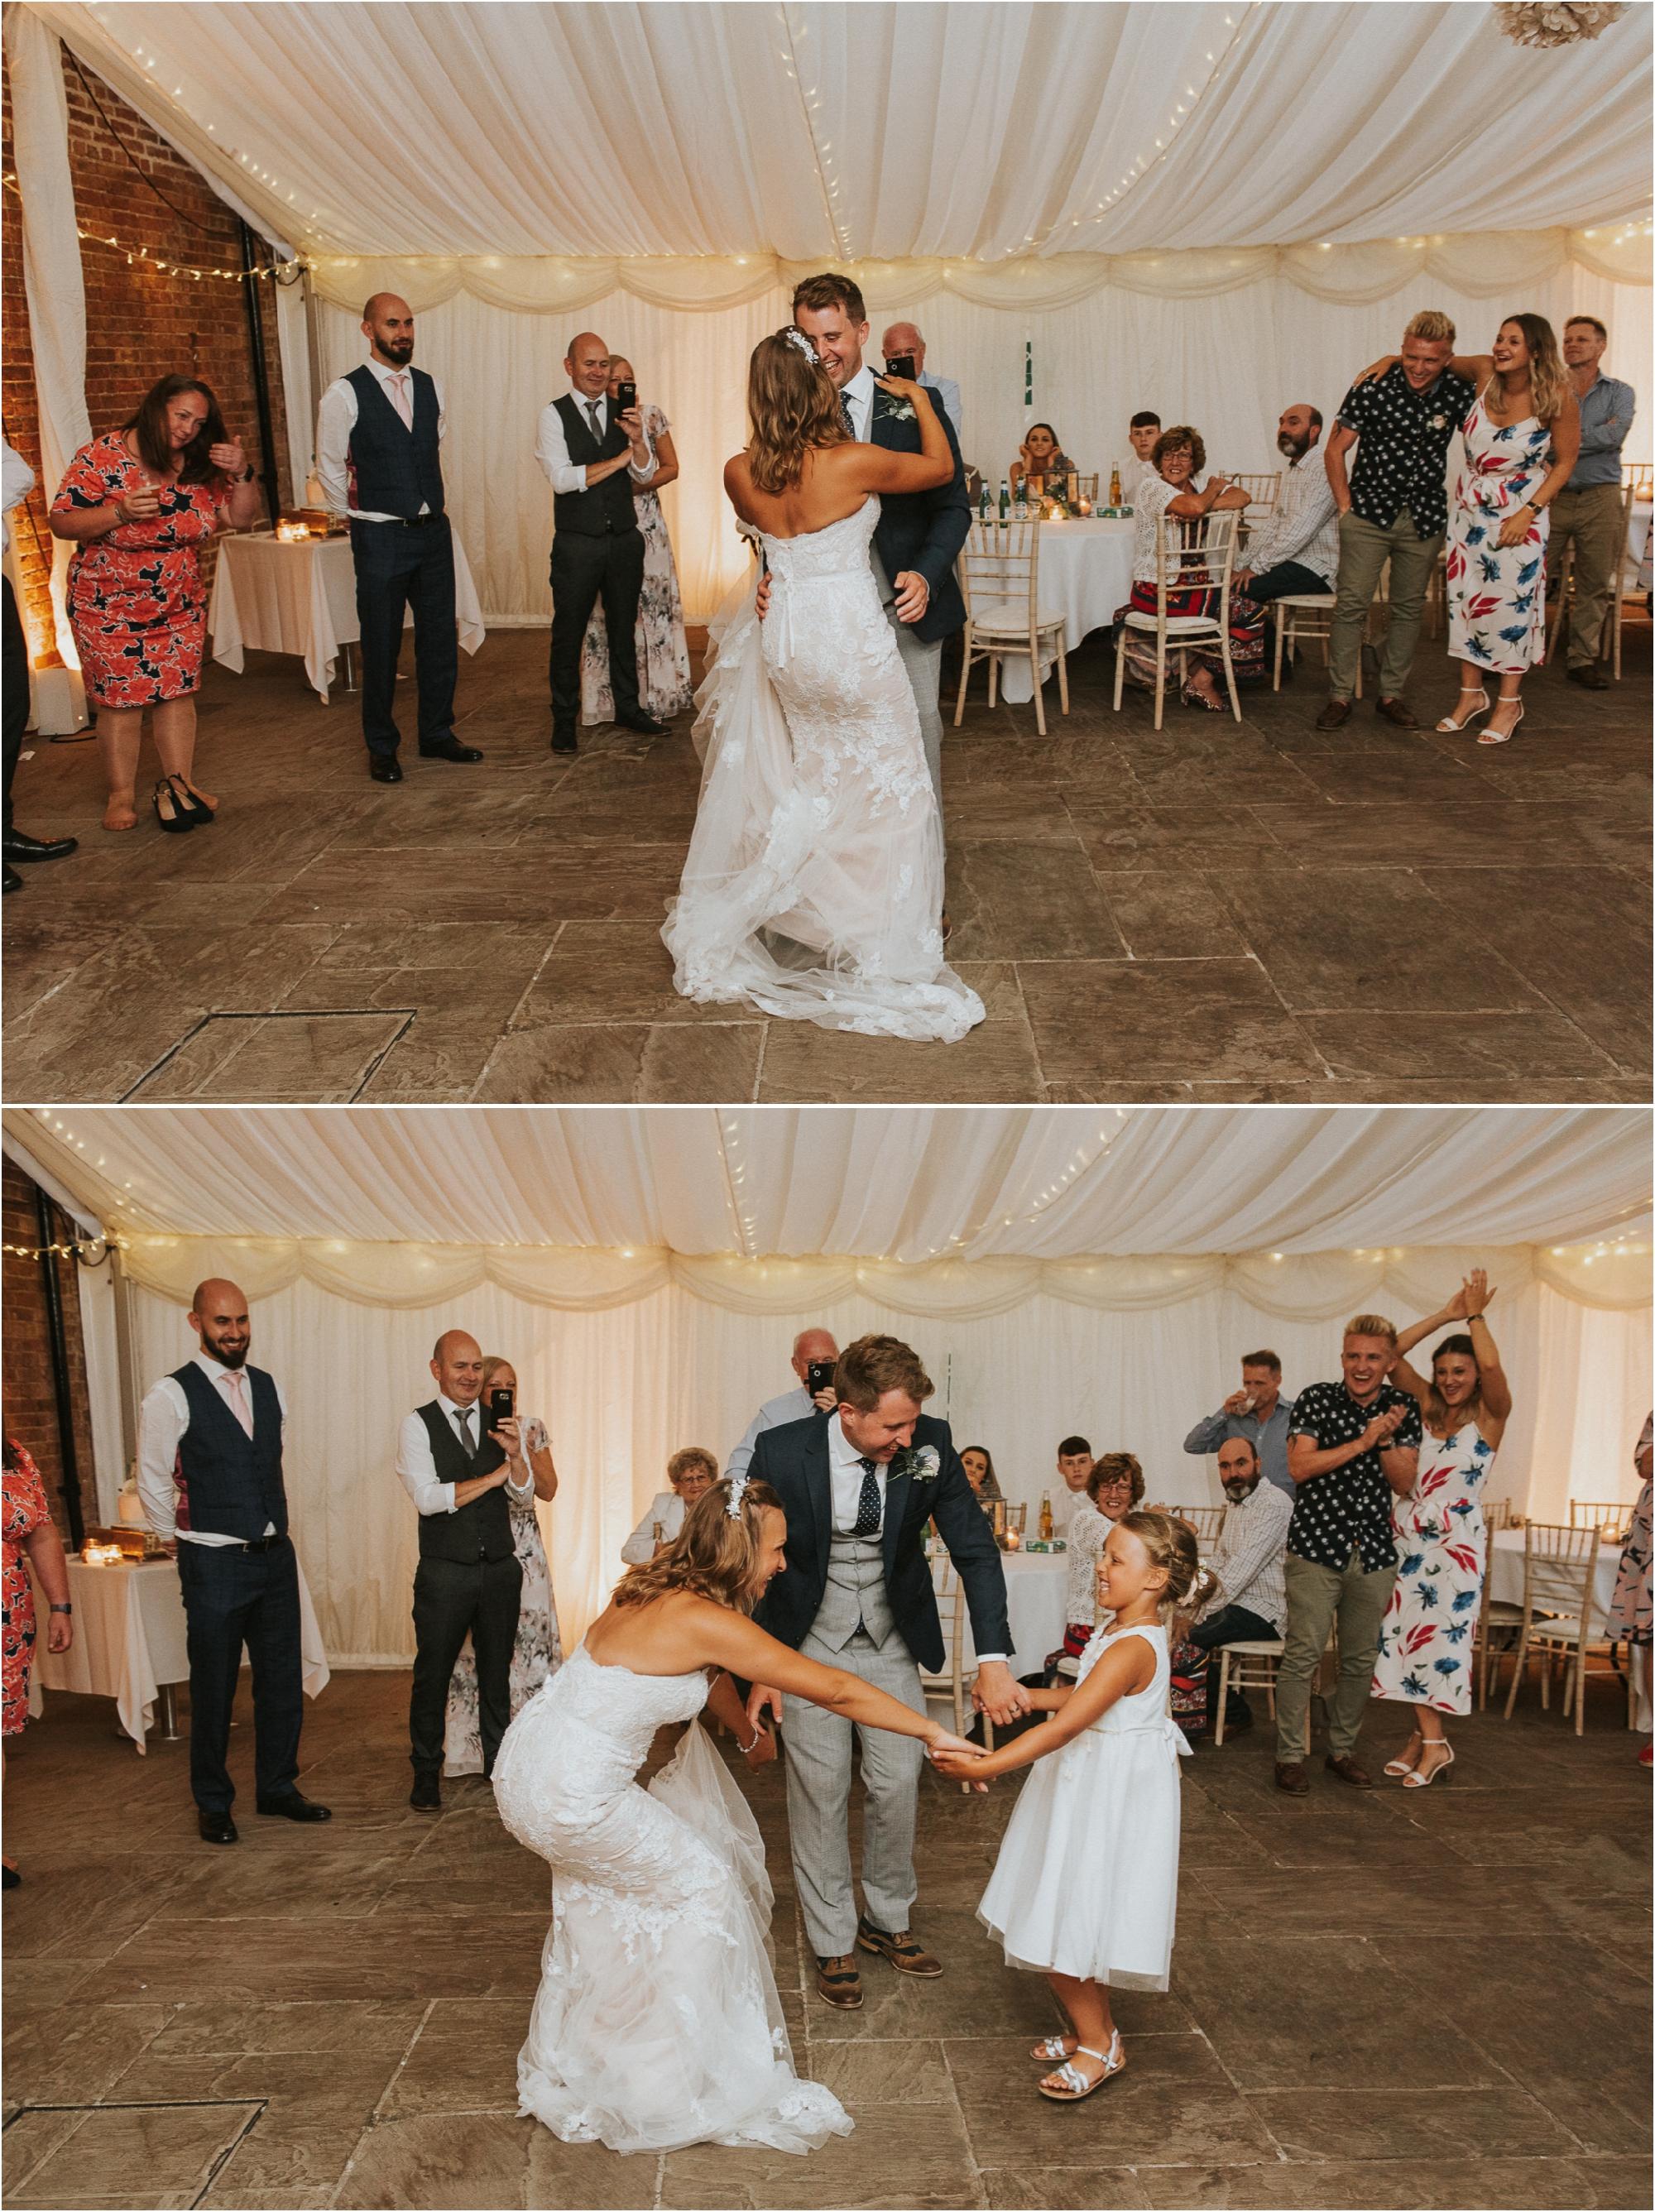 PheasantBrewery-LukeHolroyd-Yorkshirewedding_000206.jpg